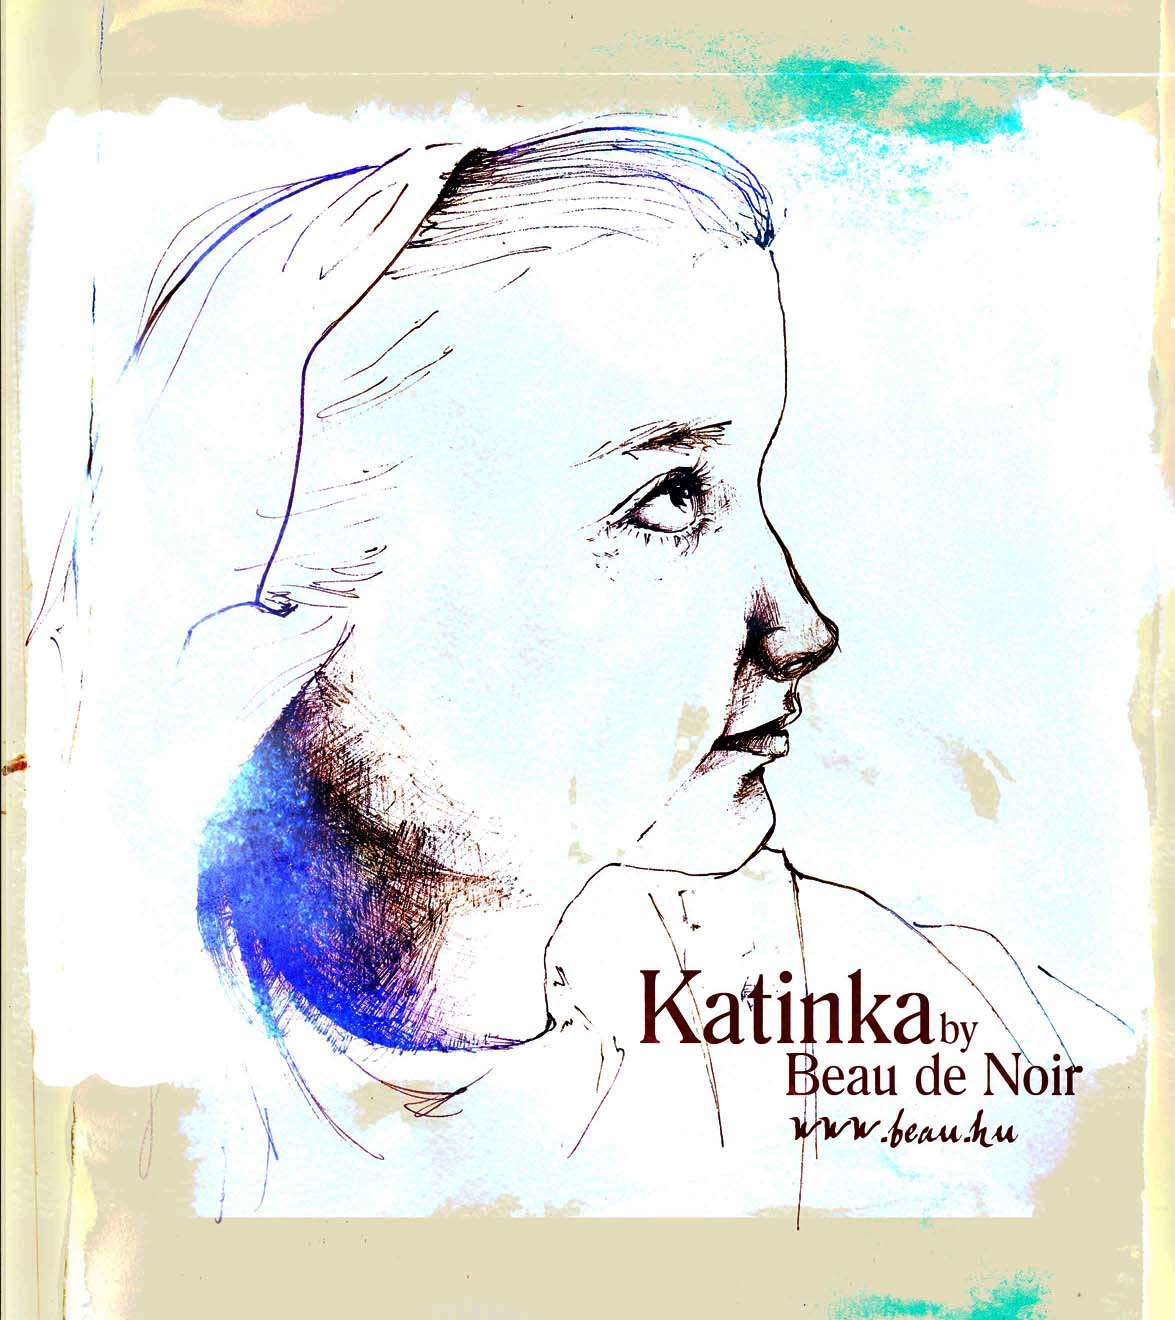 Katinka portré b by Beau de Noir 2011 11